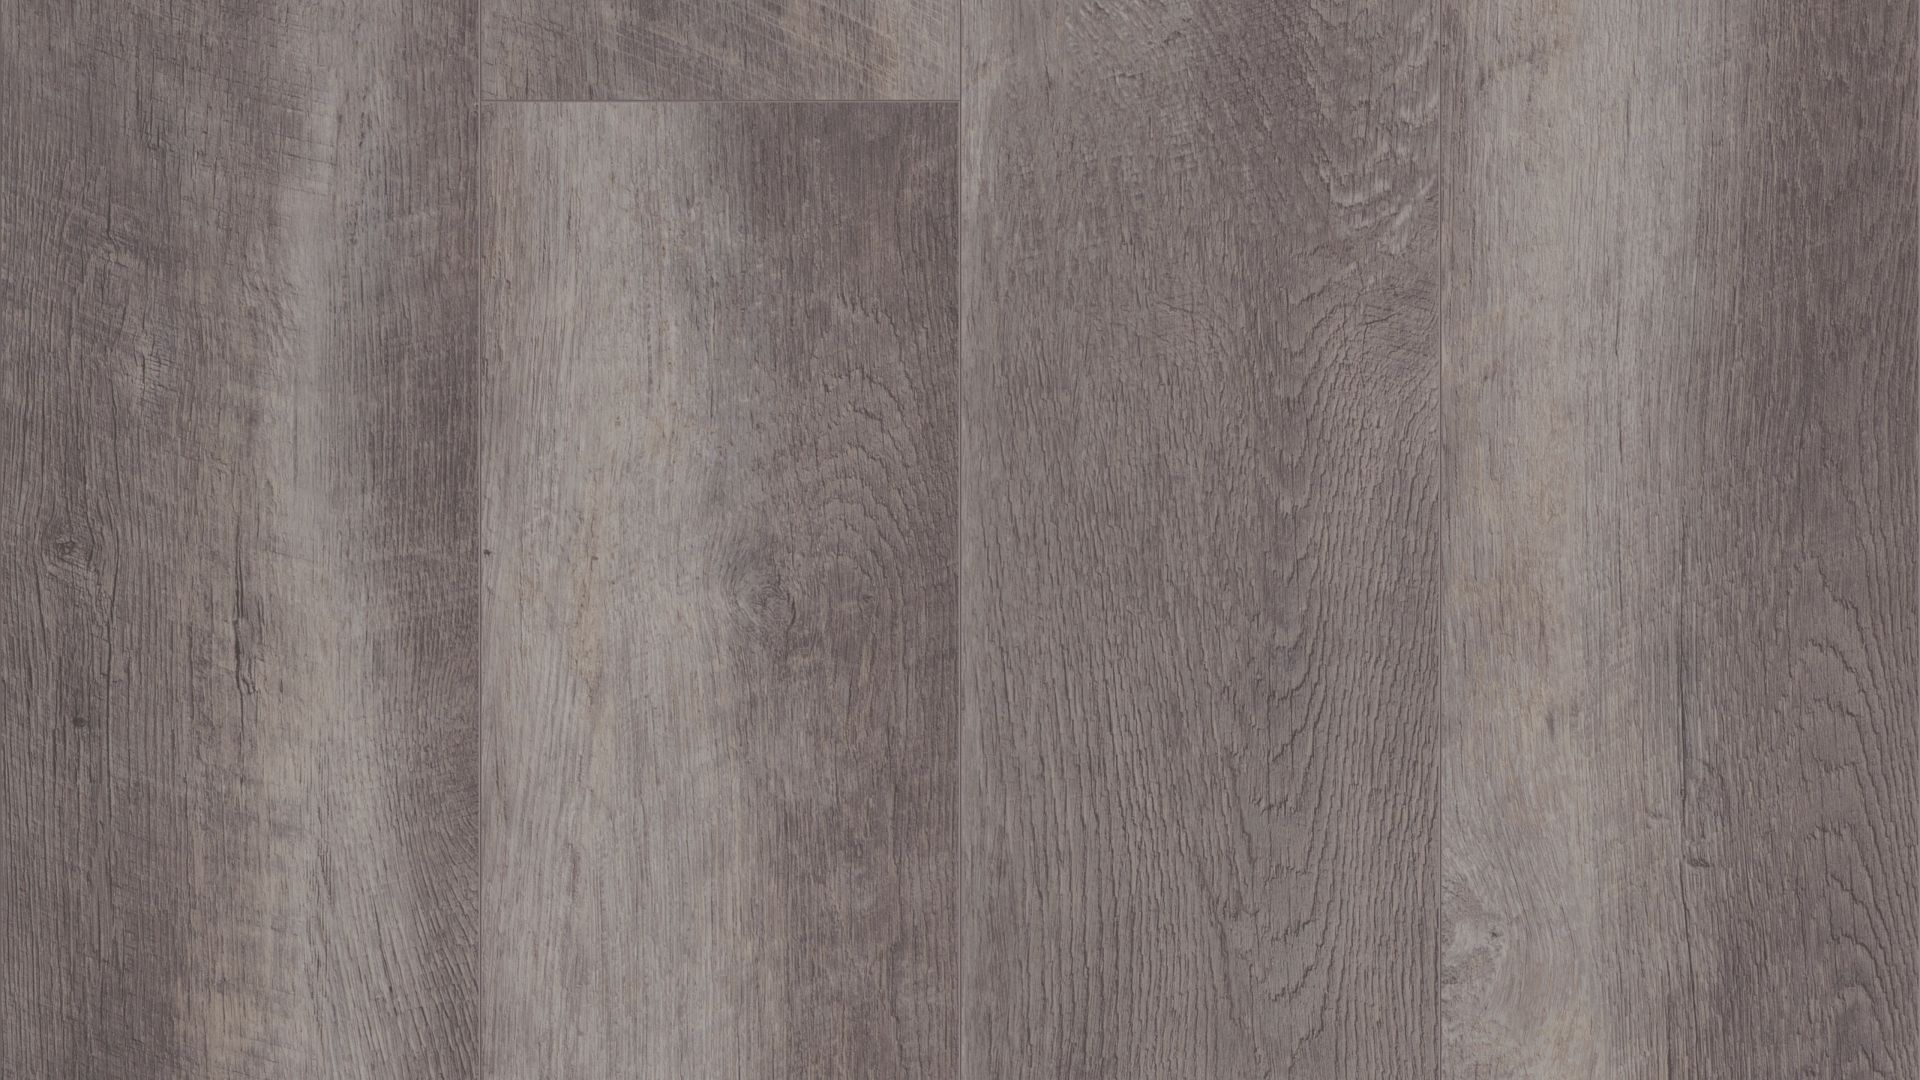 ODESSA GREY DRIFTWOOD EVP Vinyl Flooring Product Shot